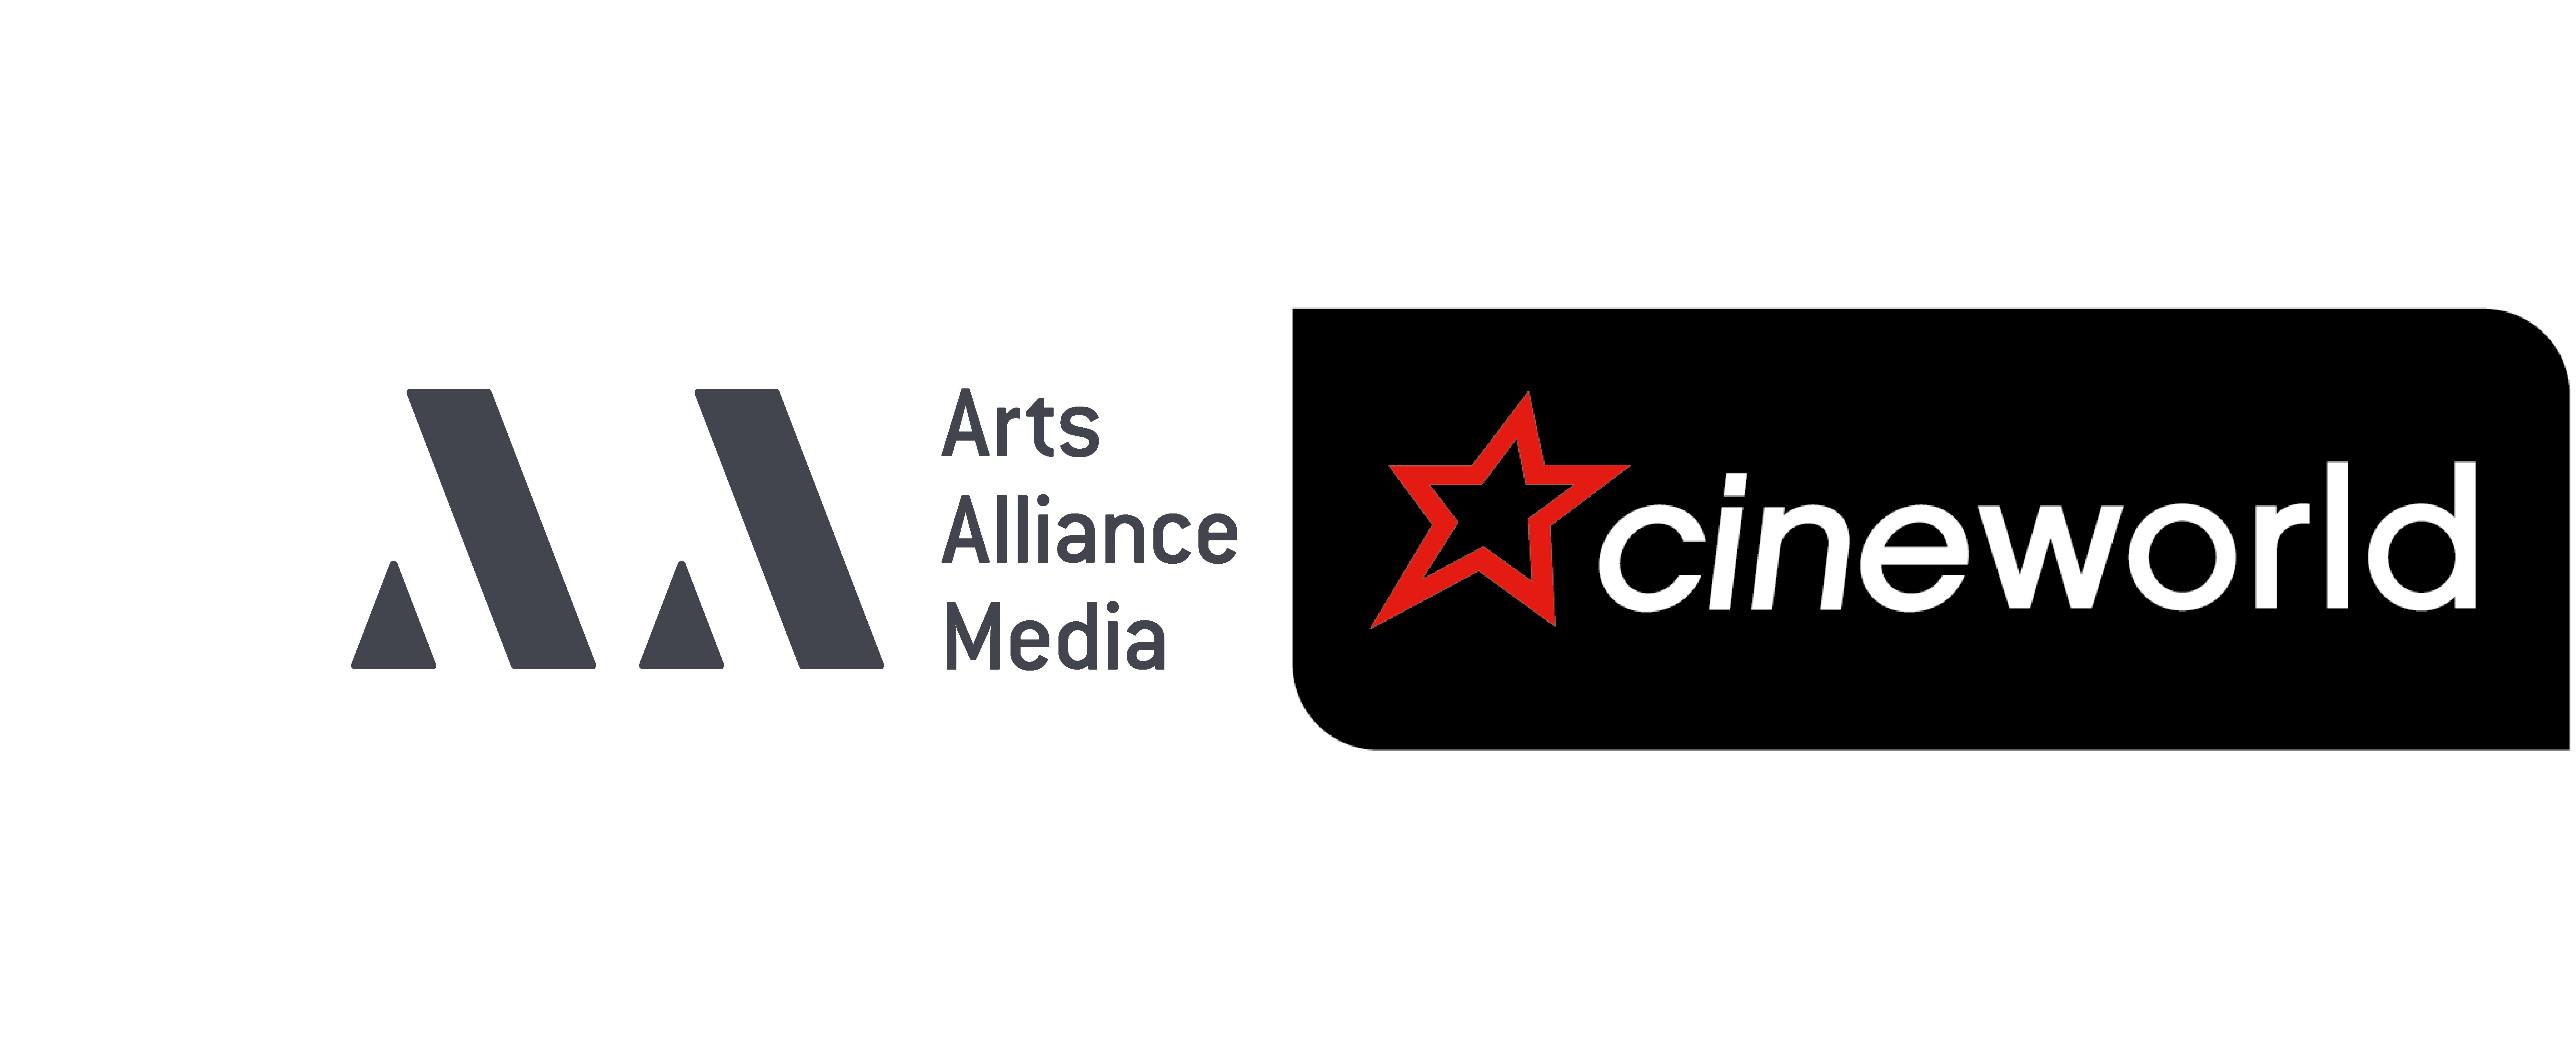 Cineworld Group Extends AAM Software to Regal Cinemas, Centralising